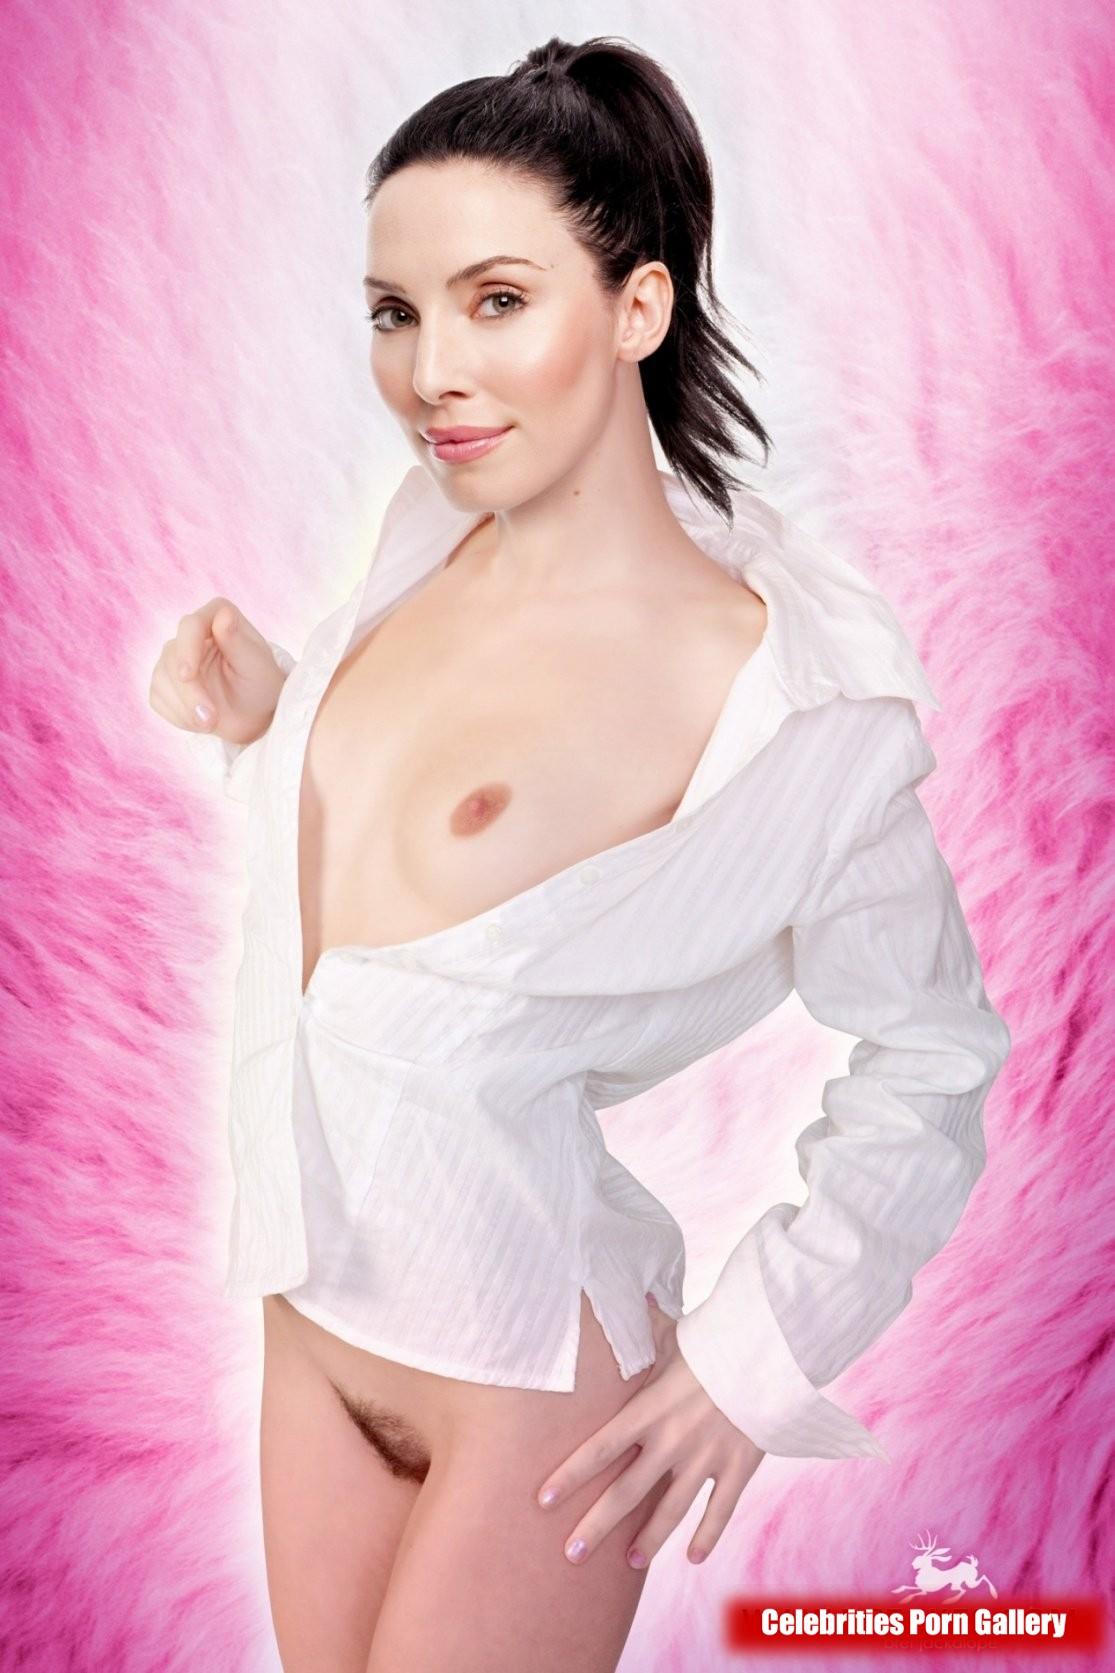 Whitney Cummings Nude Celeb Pics